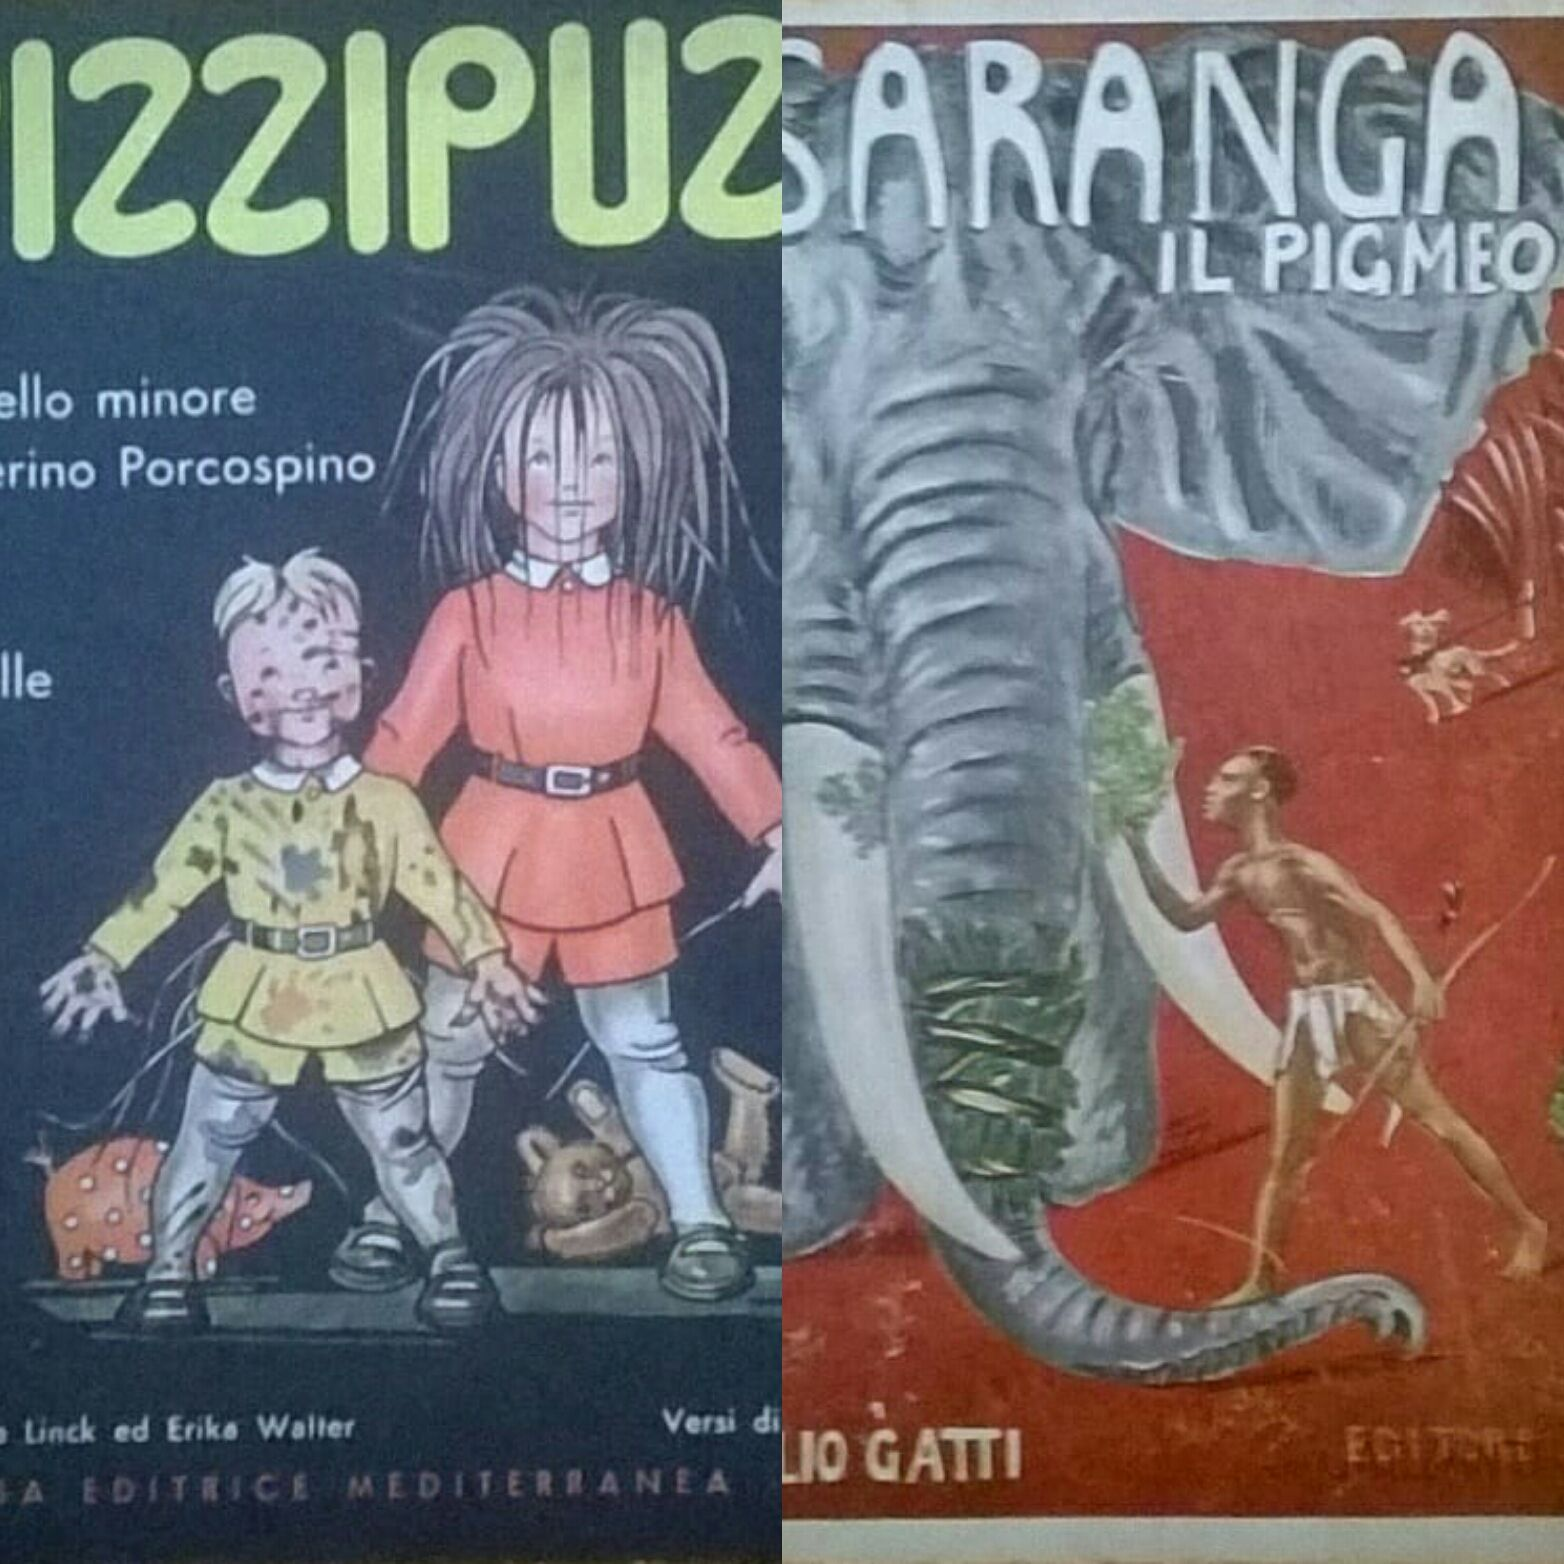 """Pizzipuzzi"" e ""Saranga il pigmeo"" in bancarella"